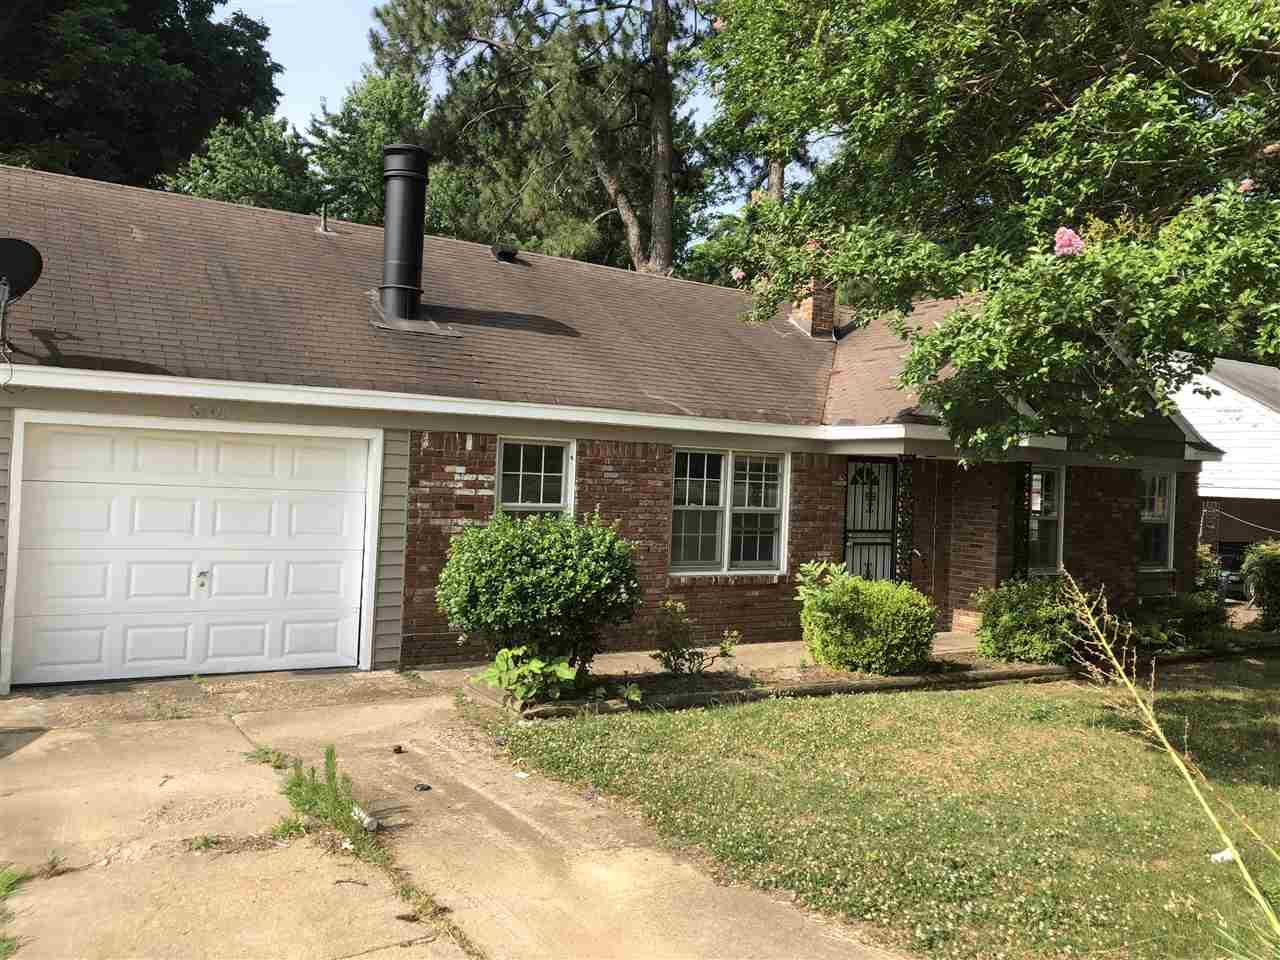 3105 Winchester Memphis, TN 38118 - MLS #: 10029324